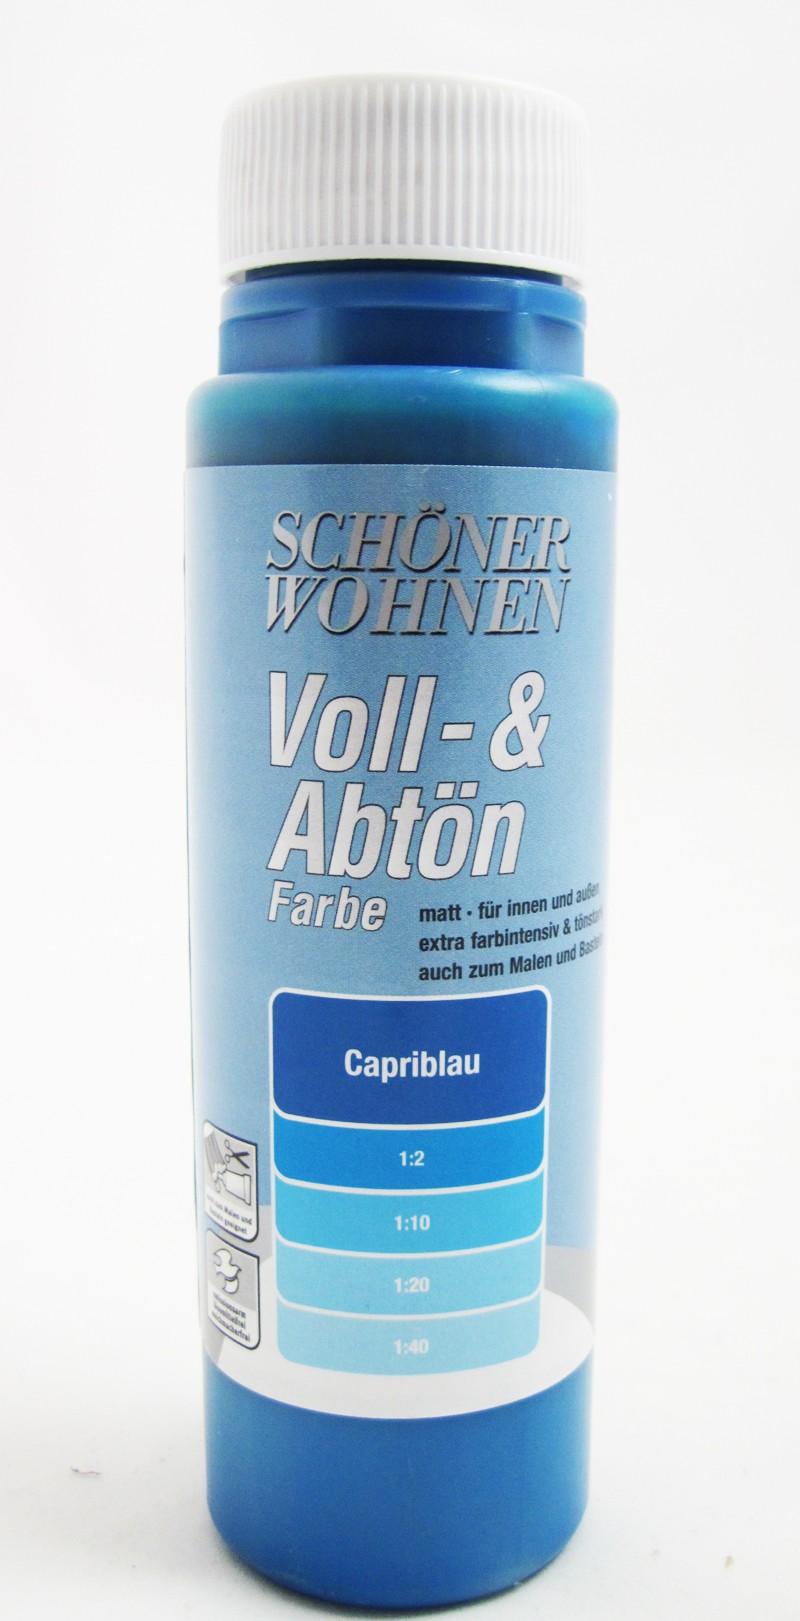 Voll- und Abtönfarbe Capriblau 250 ml